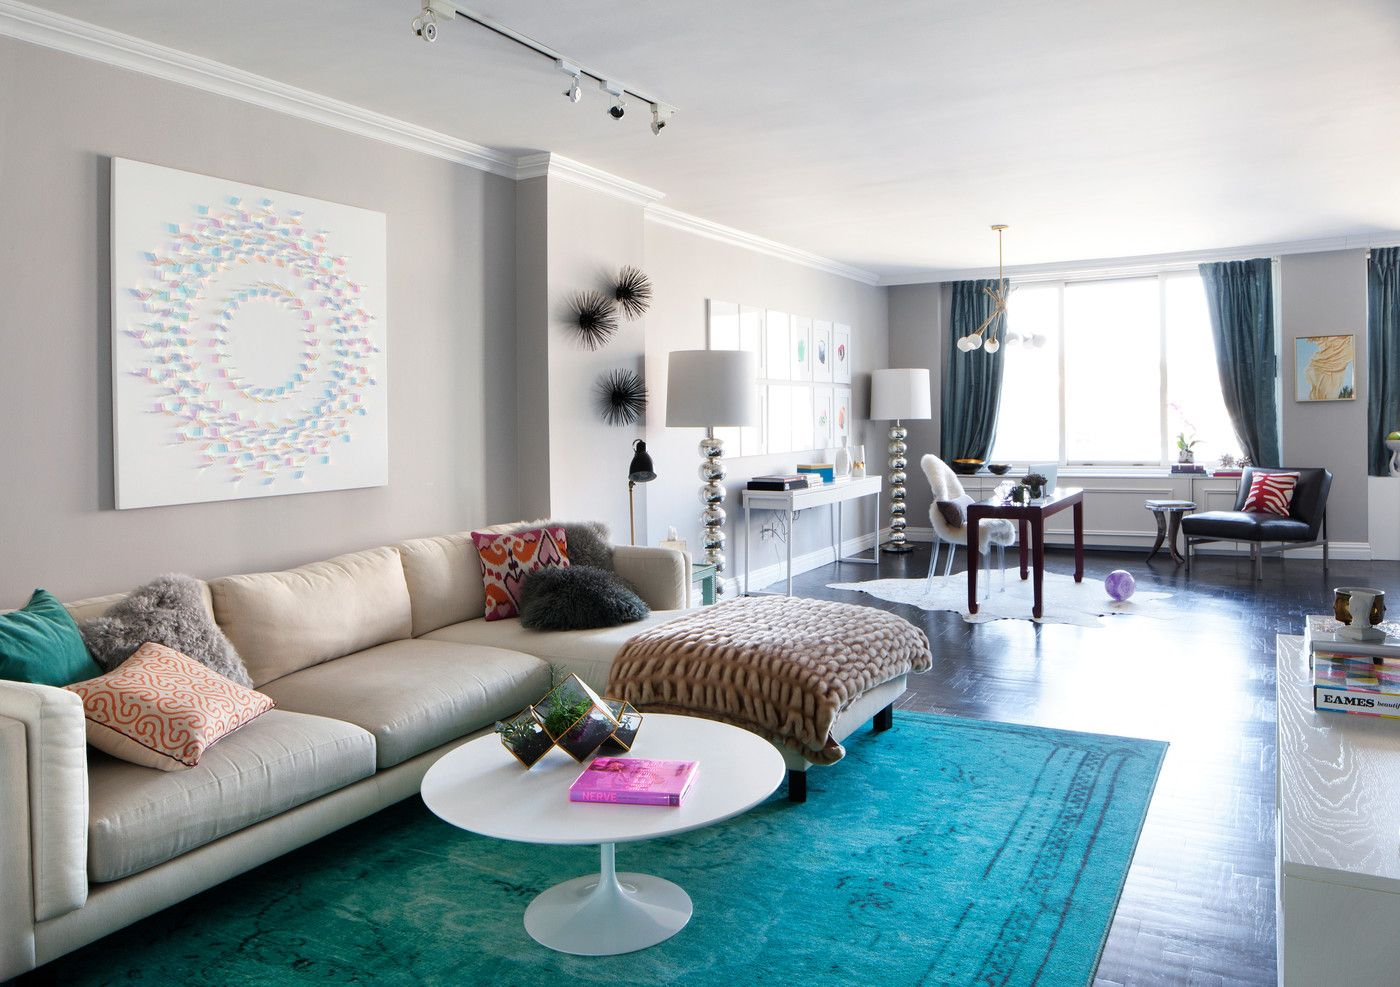 Contemporary Living Room Photos | Colorful throw pillows, White ...